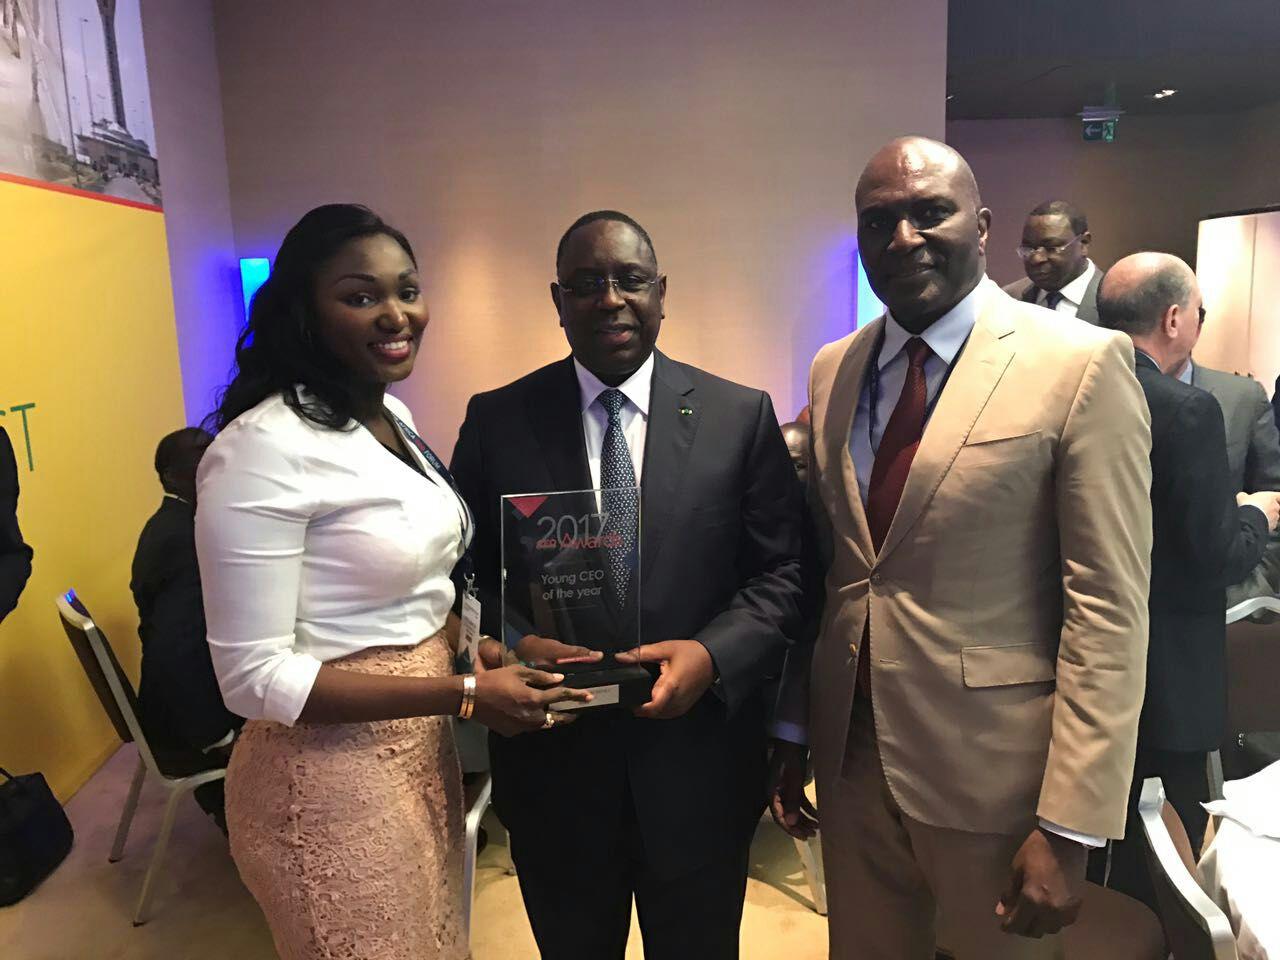 20 milliards, Babacar Ngom, club des investisseurs, Sedima